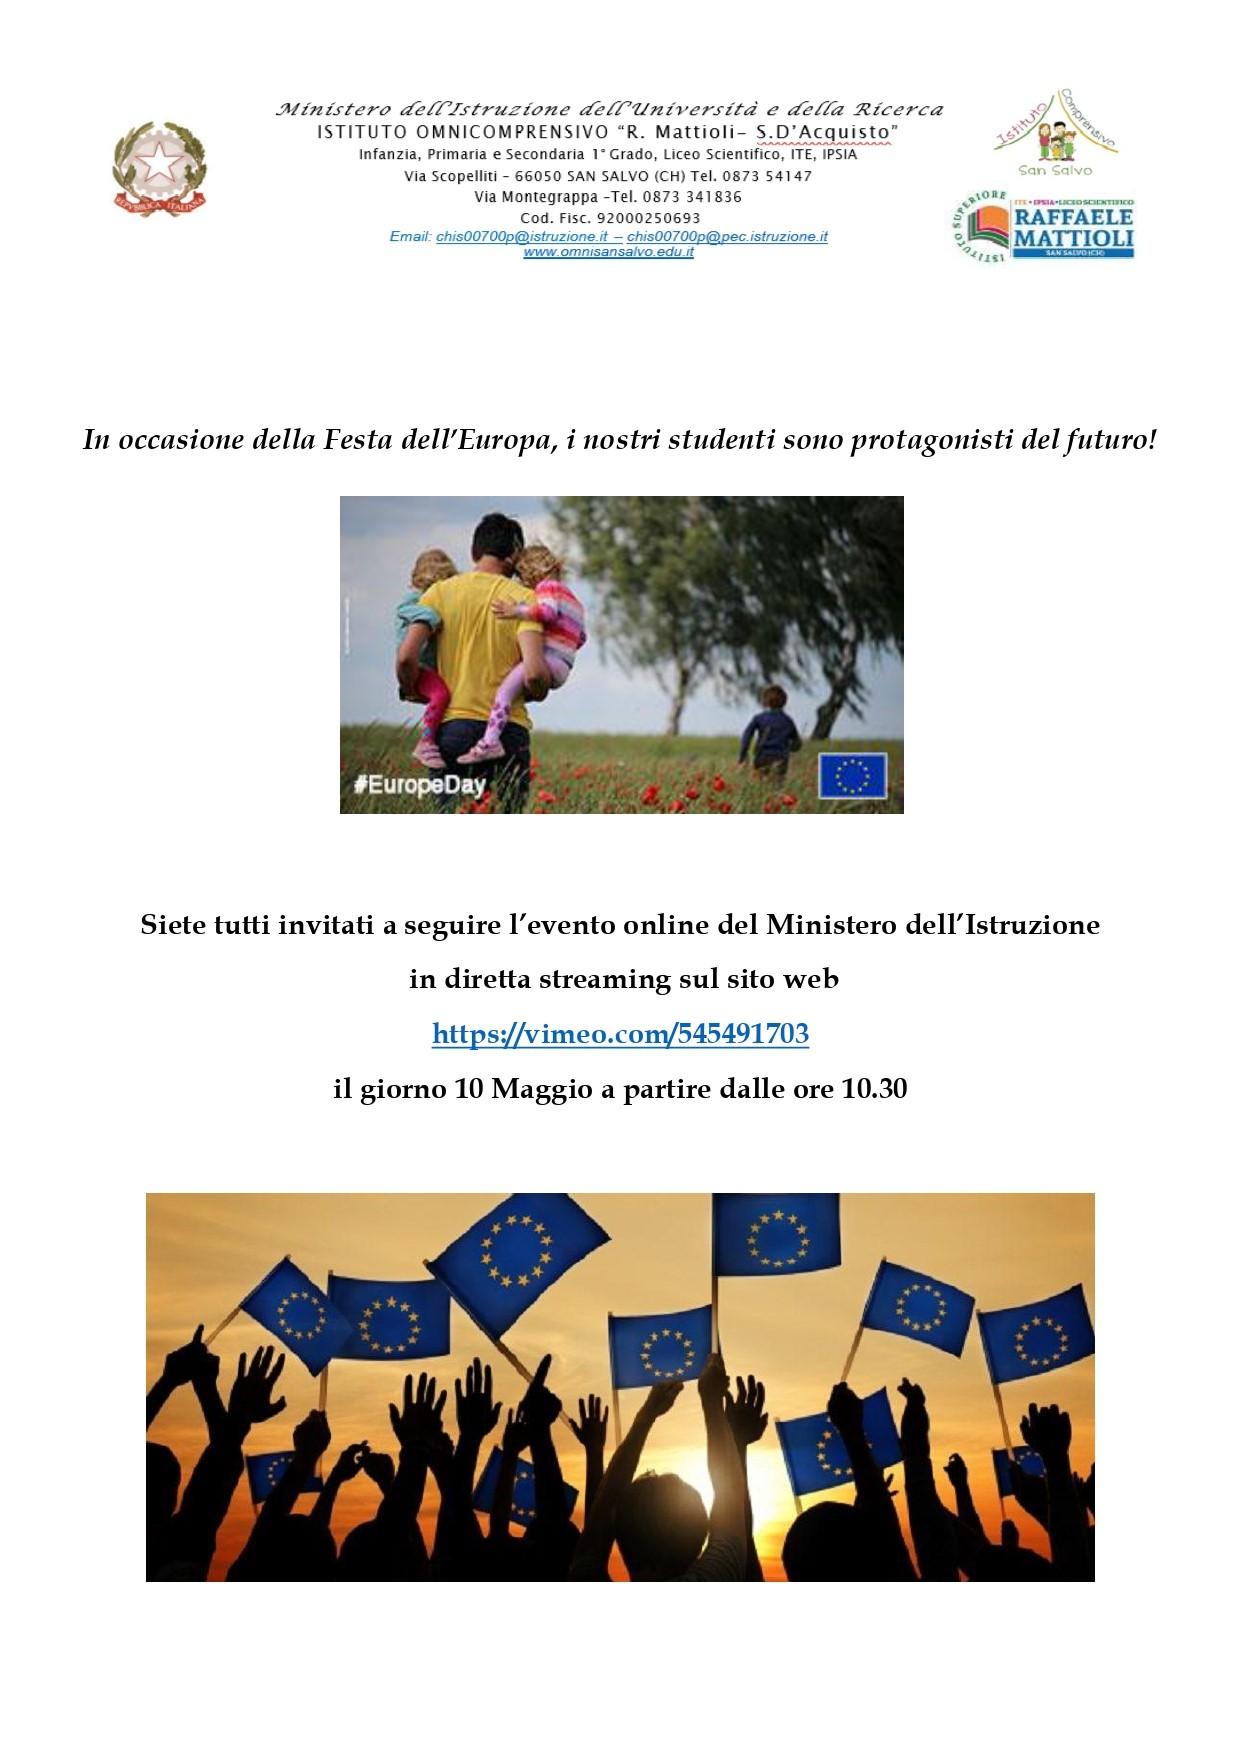 LOCANDINA FESTA EUROPA_page-0001 (1)